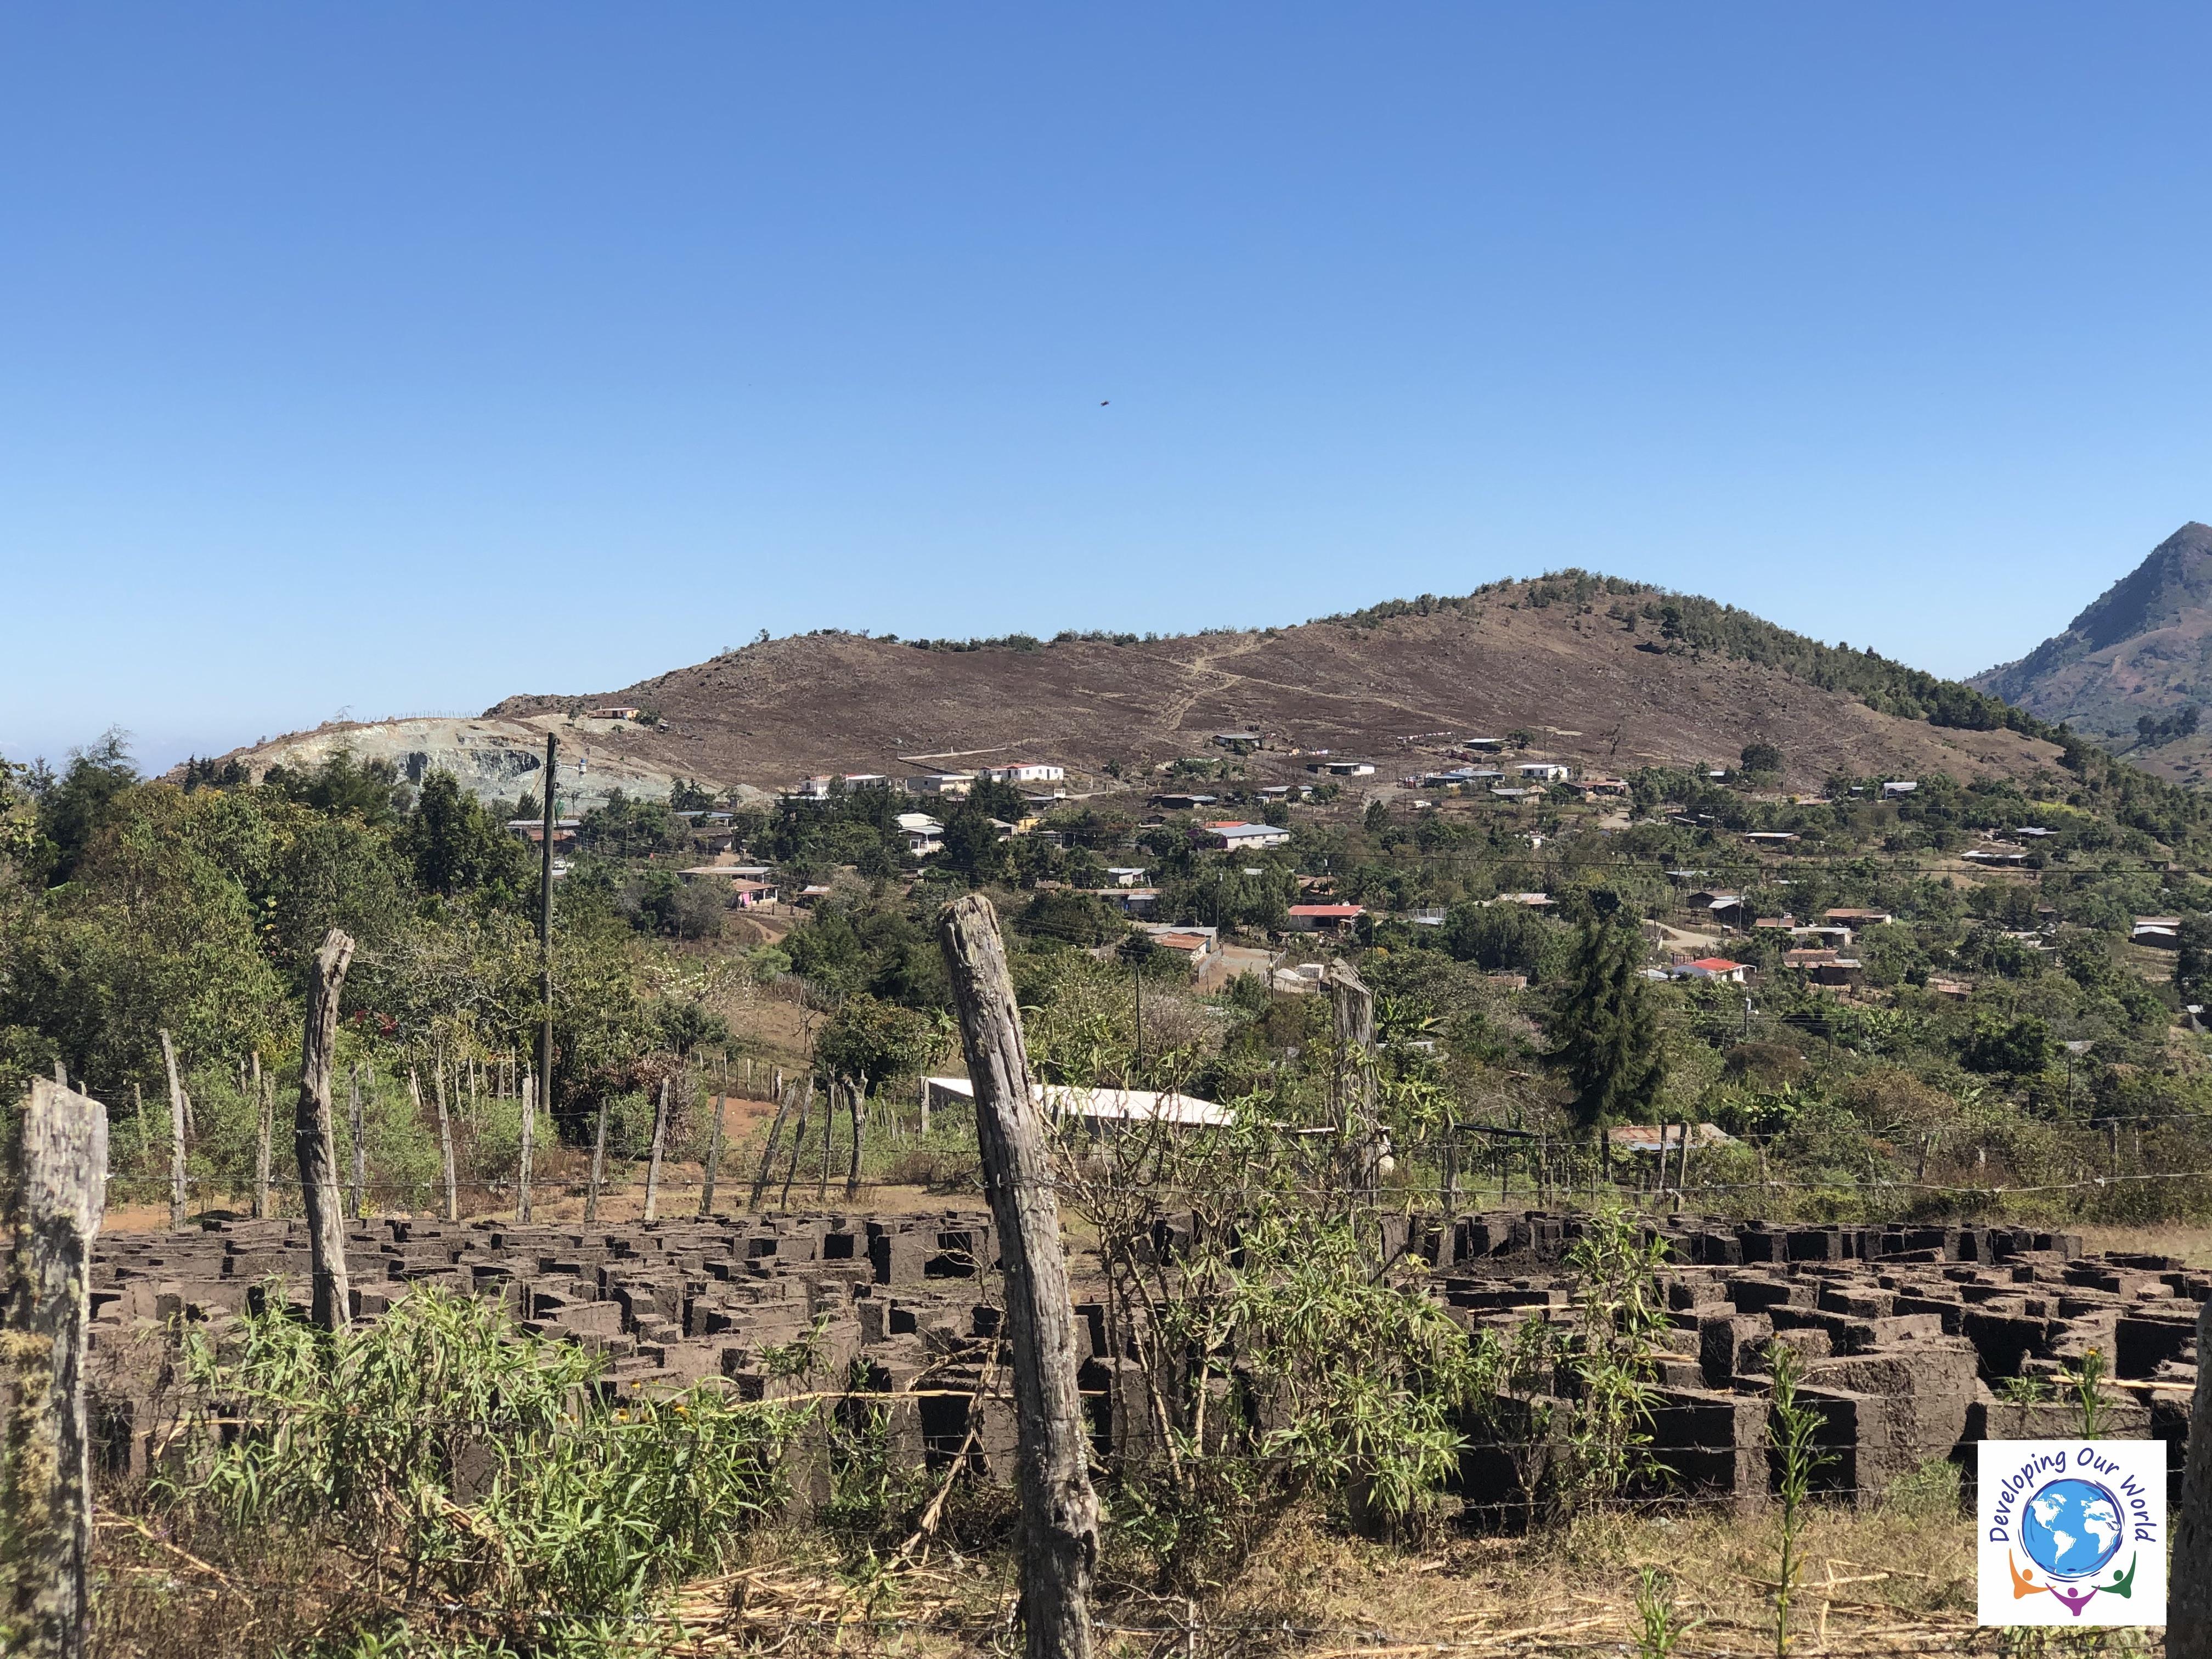 Brick factory (adobe). Village in the background